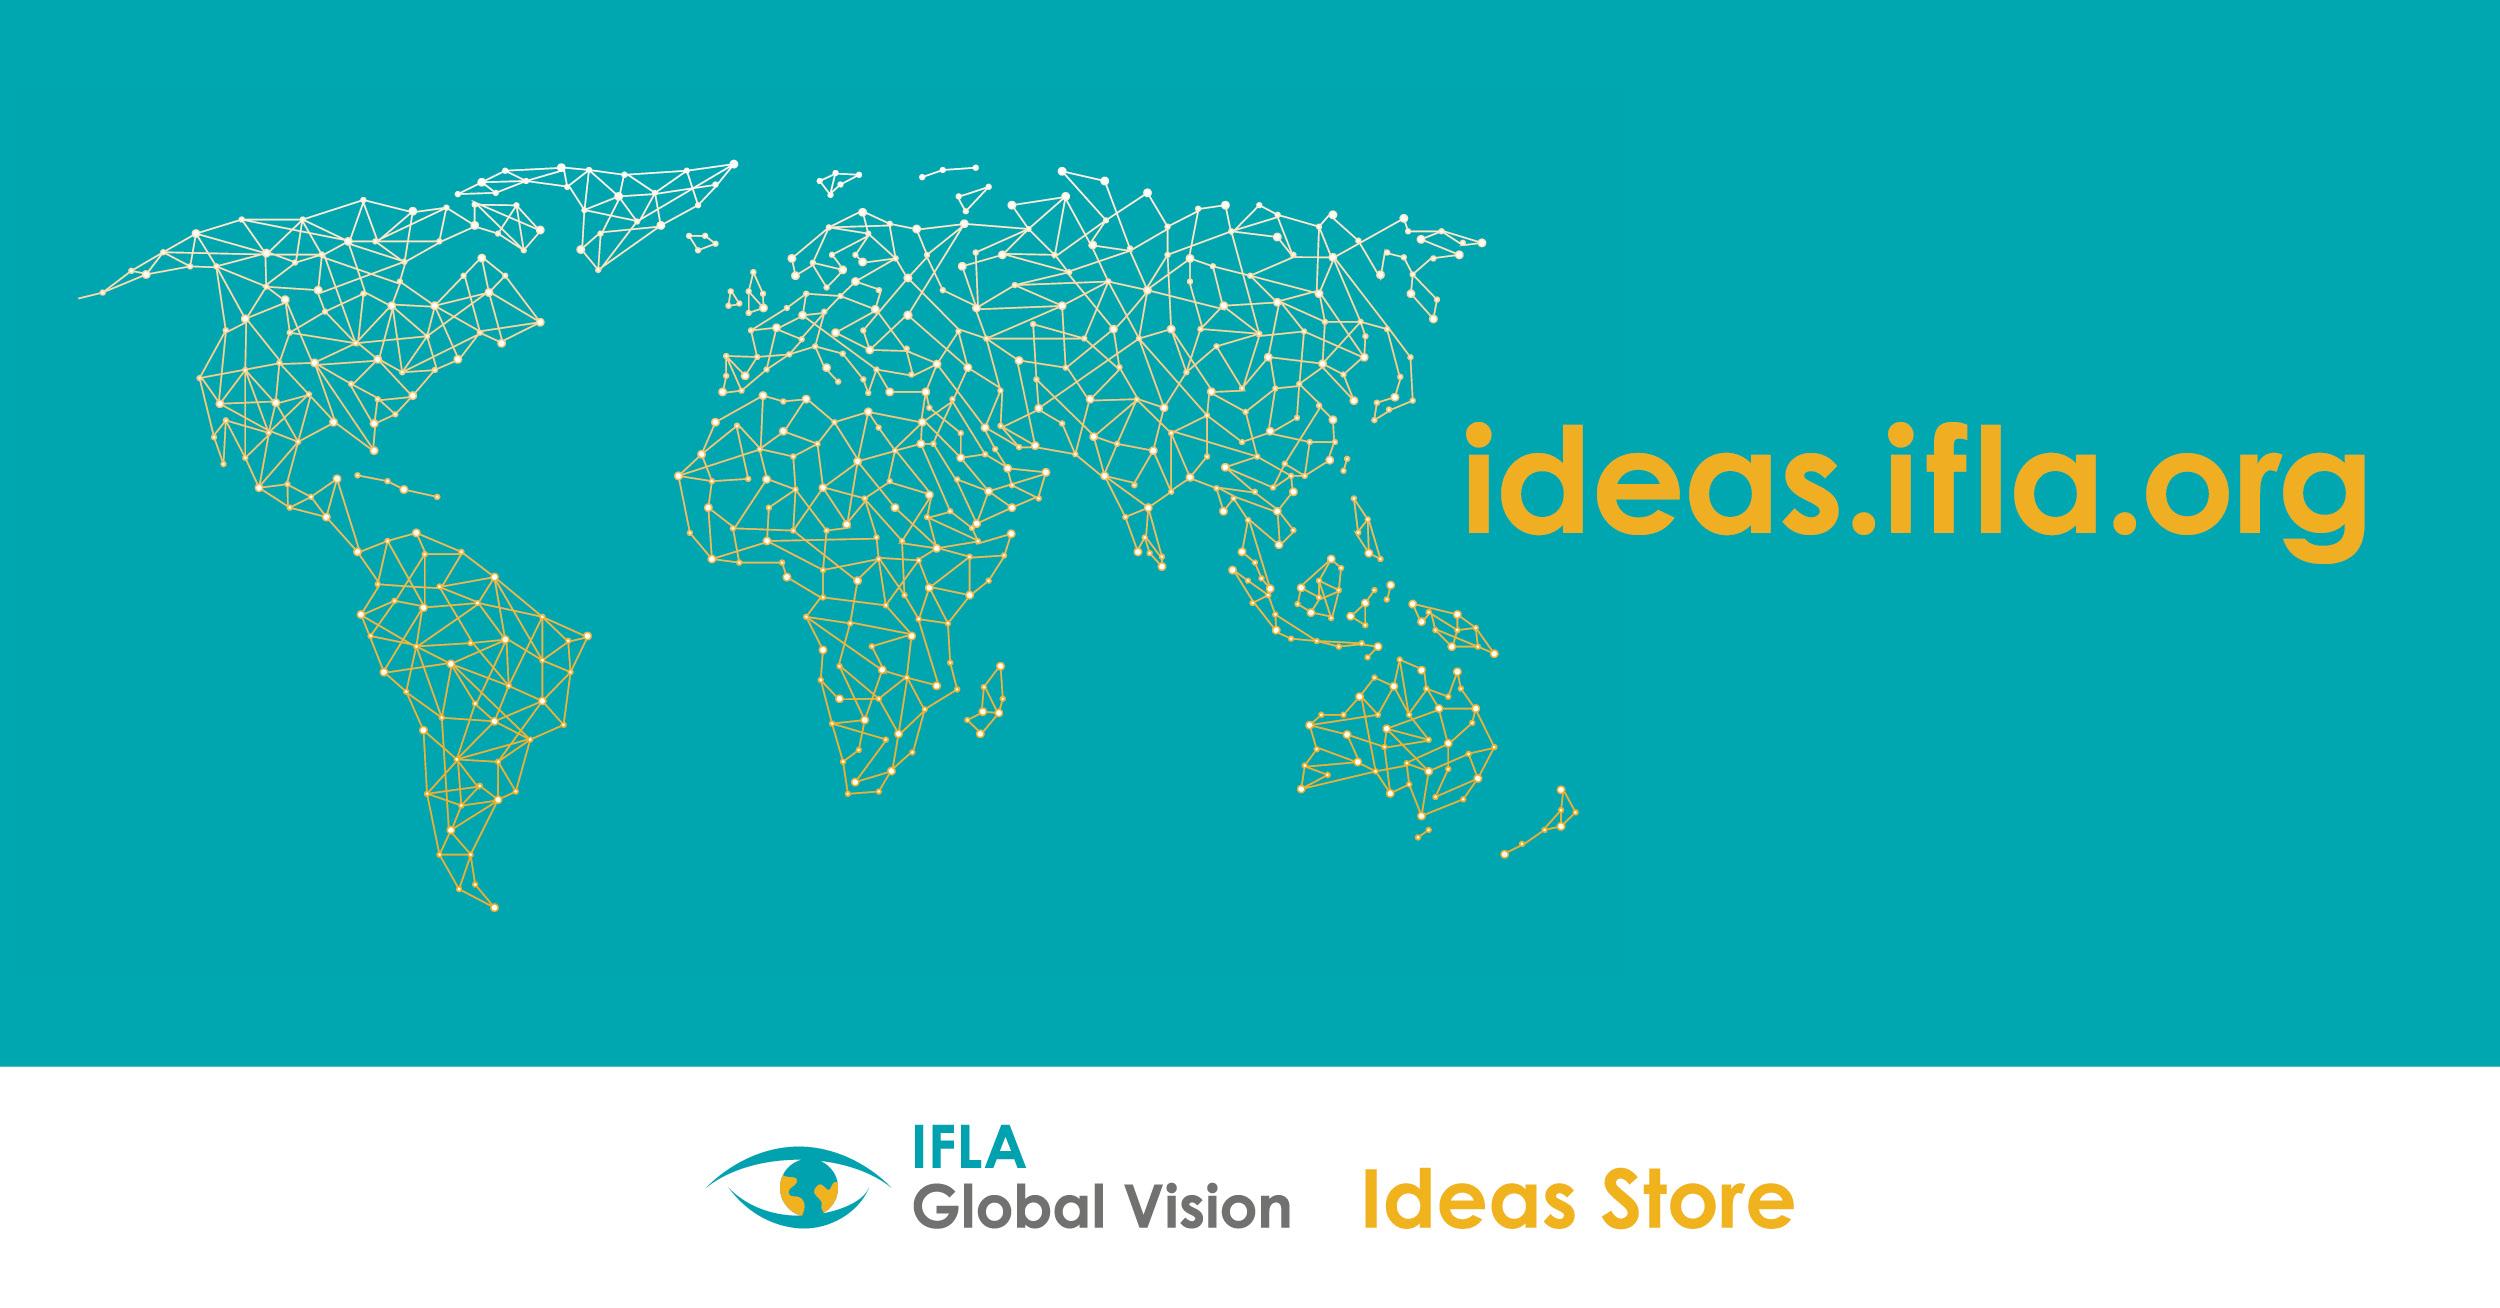 IFLA Ideas Store